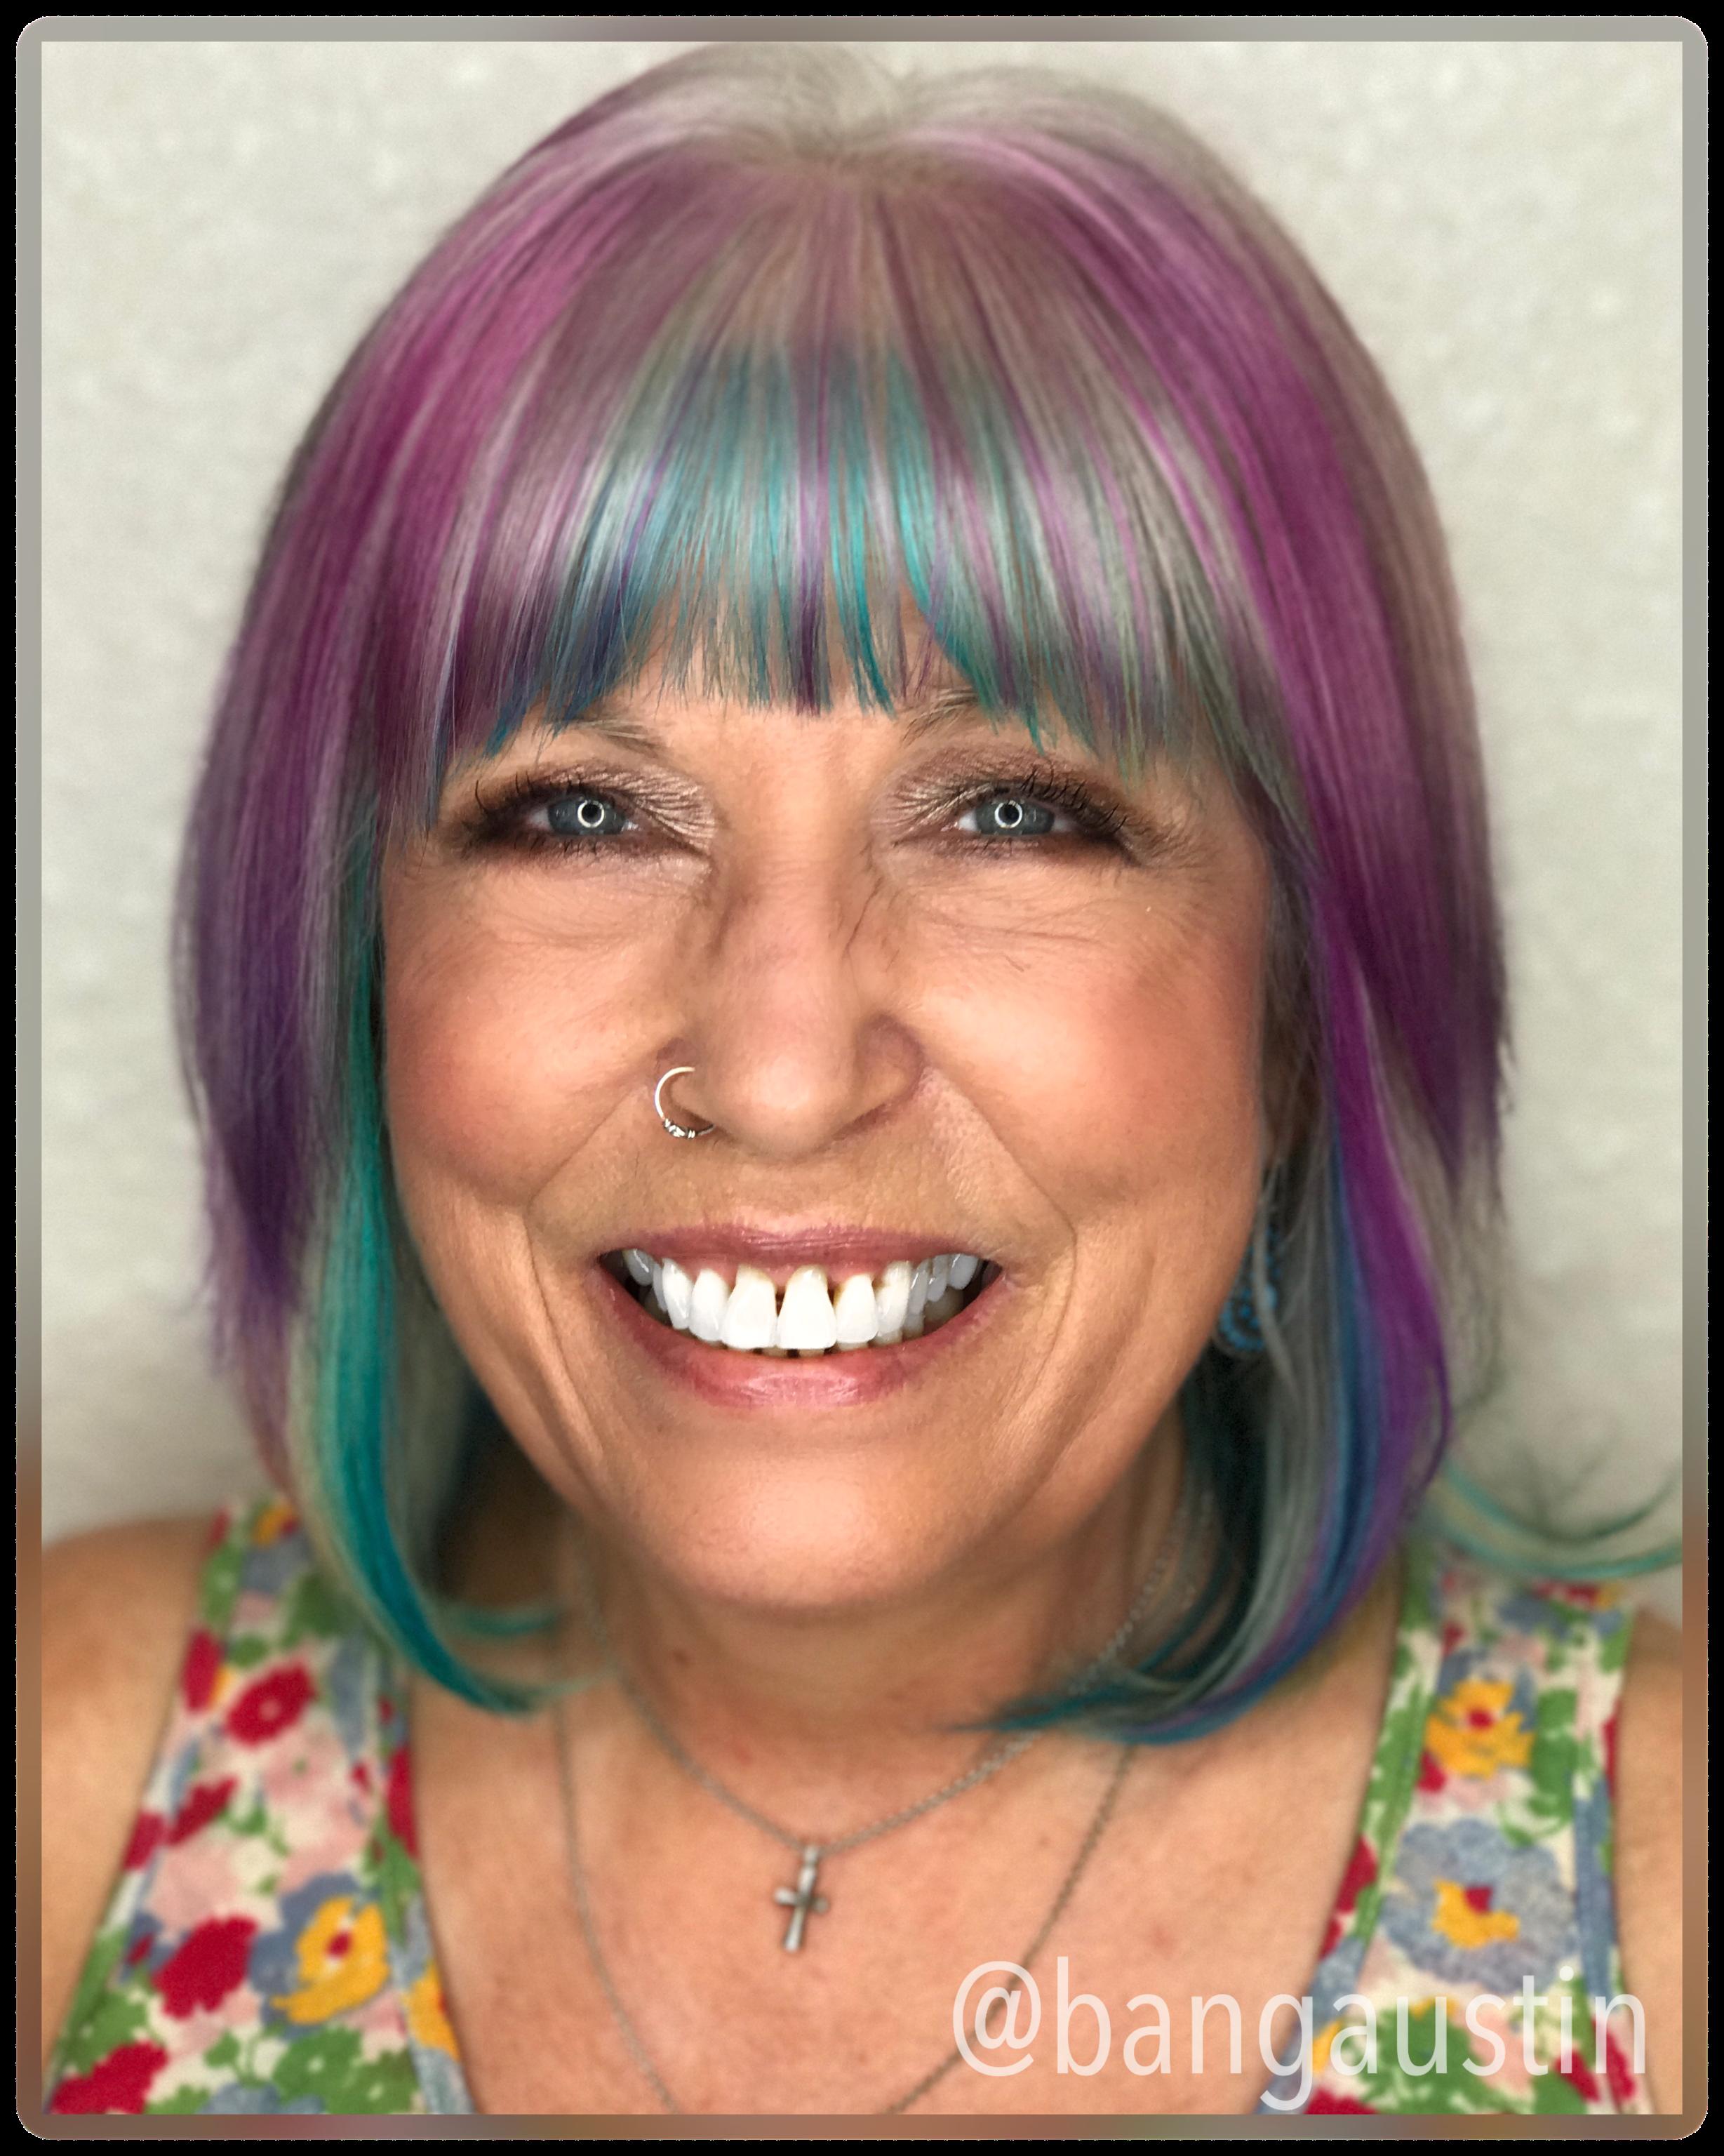 Fun fantasy colored hair BangAustin 512 514 1141